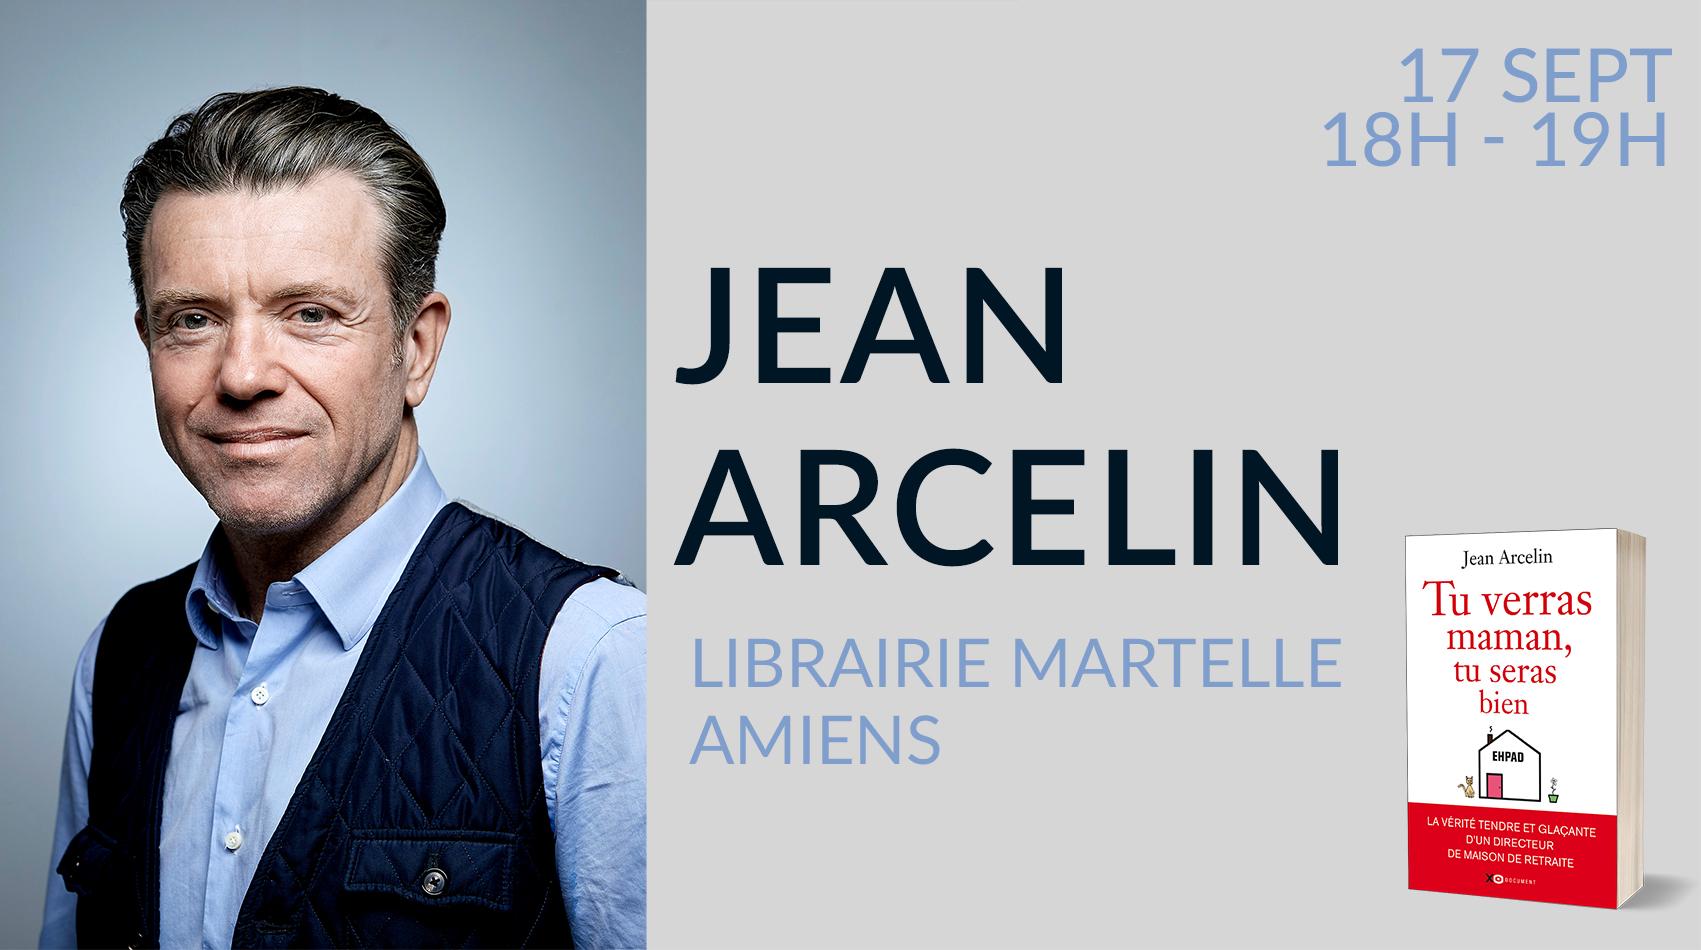 JEAN ARCELIN À AMIENS